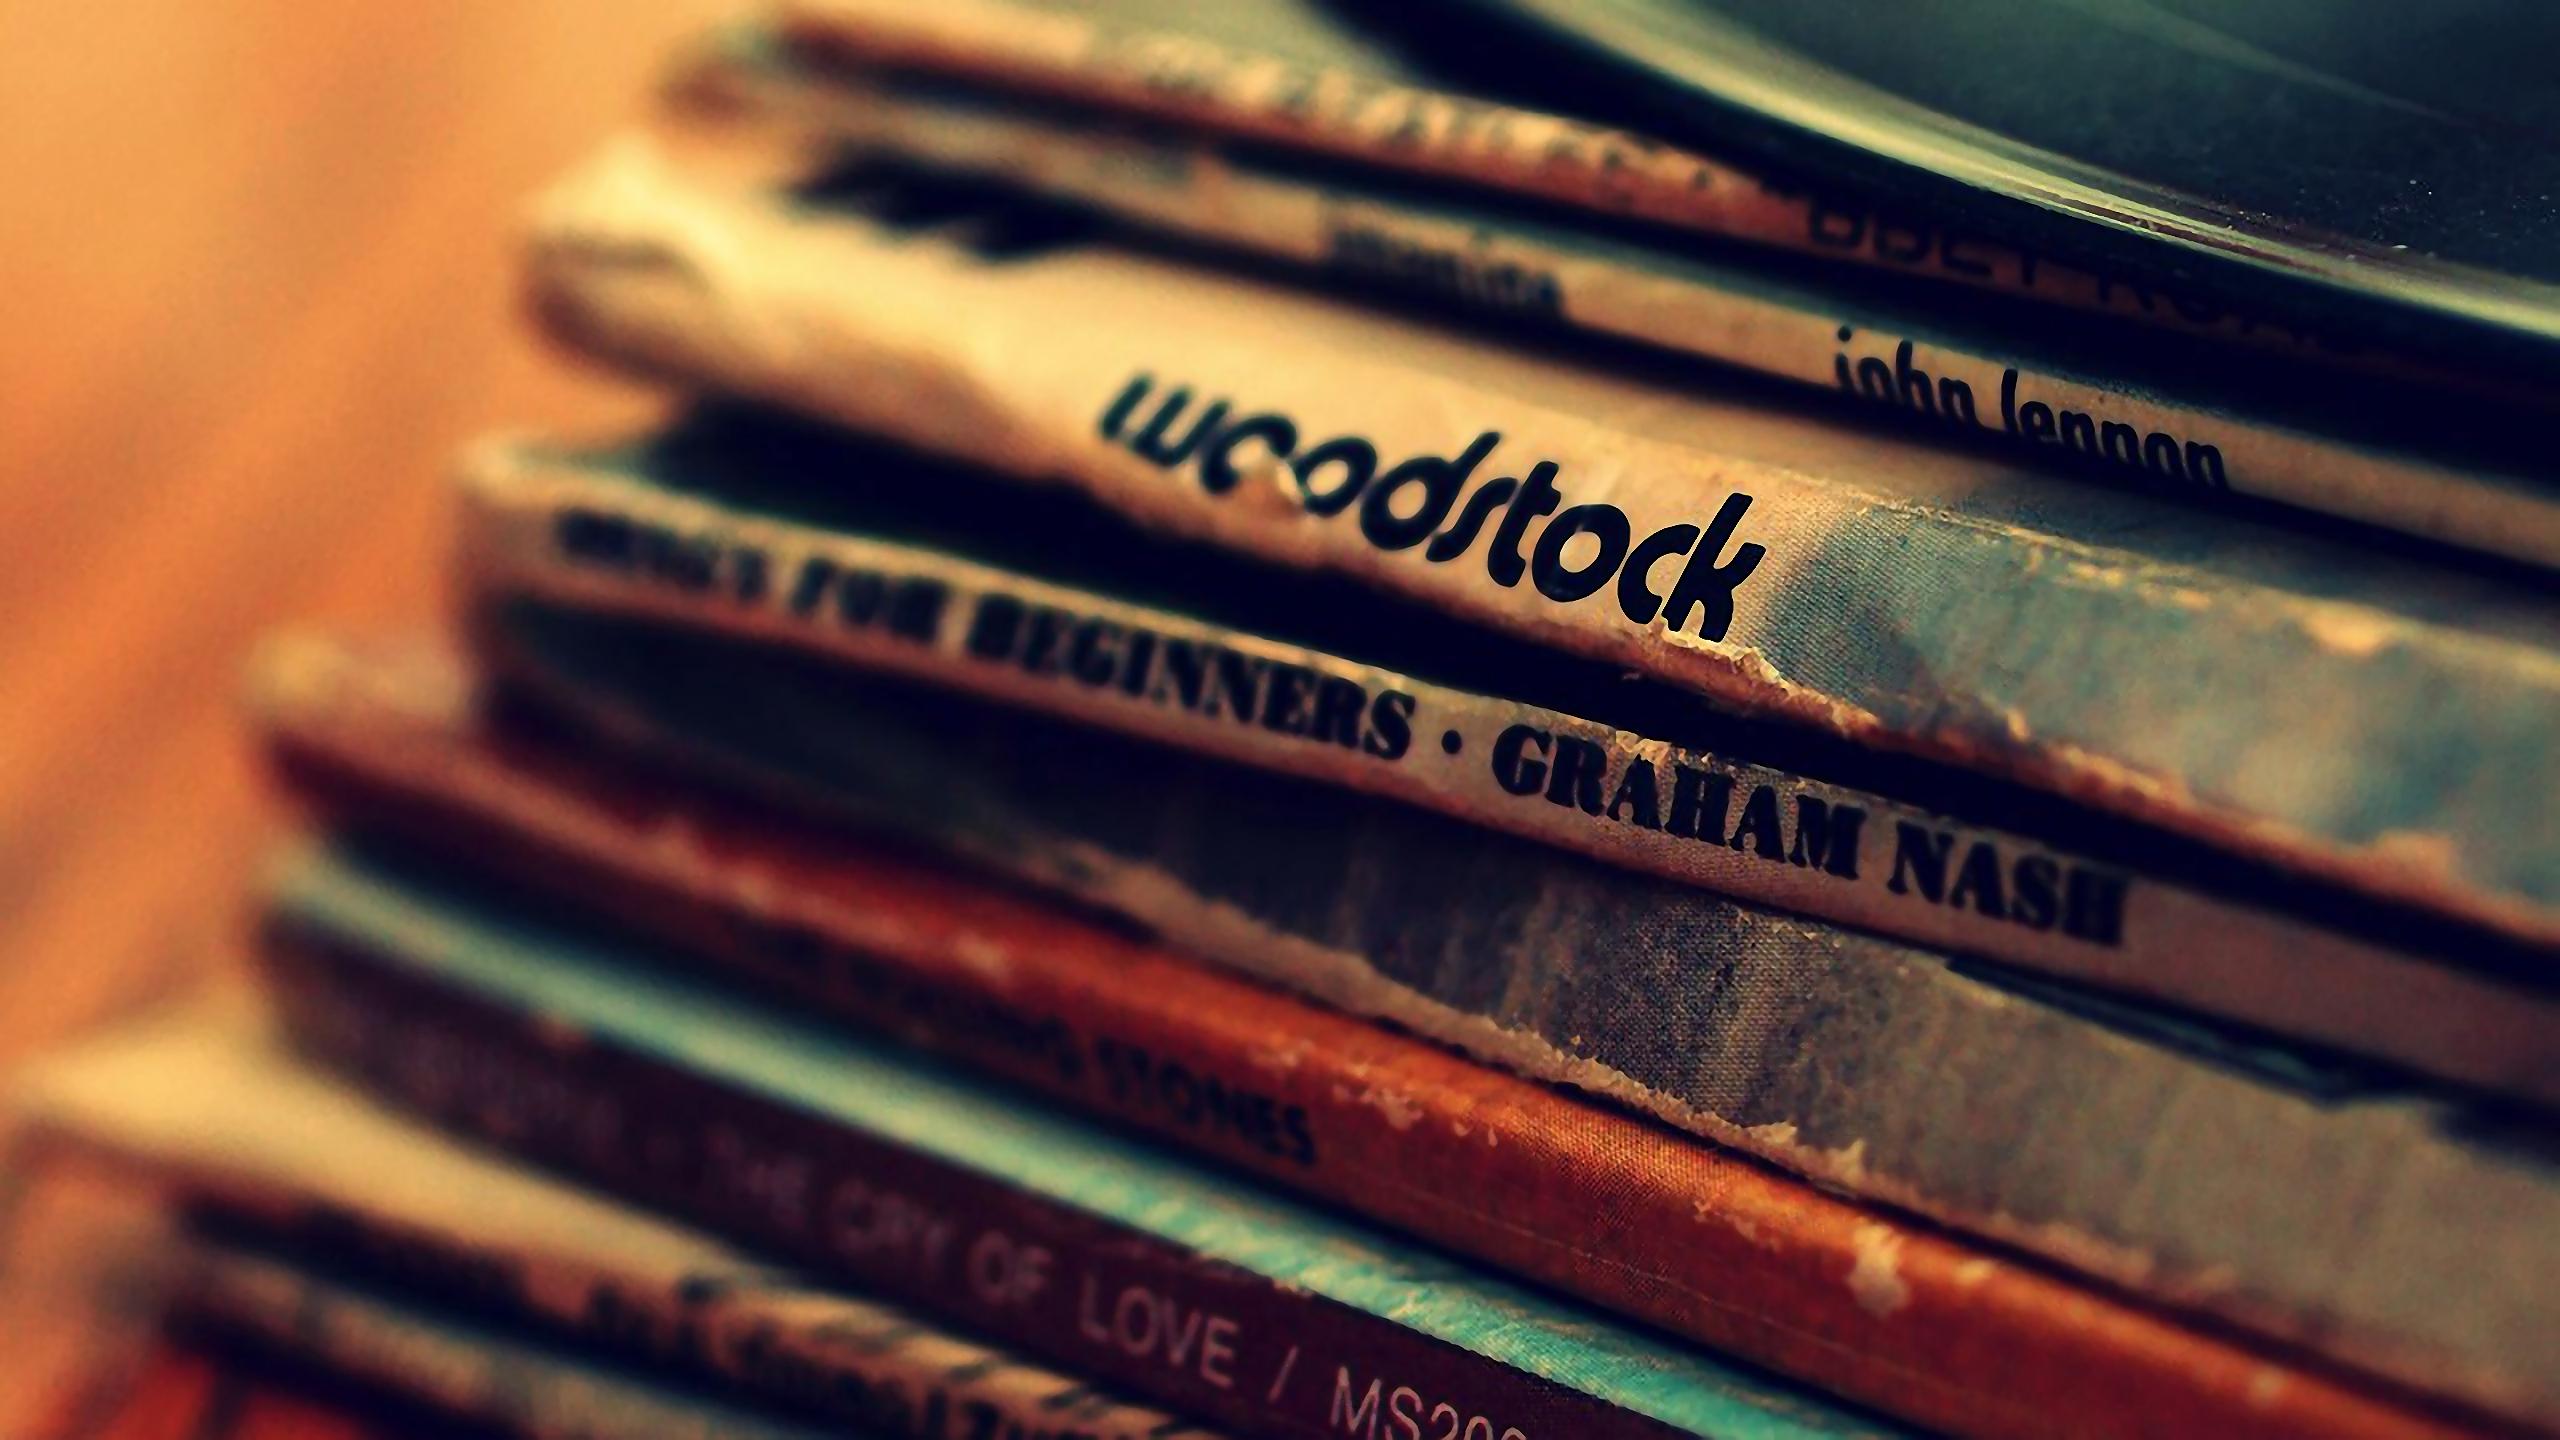 Music record vinyl woodstock wallpaper 2560x1440 10441 2560x1440